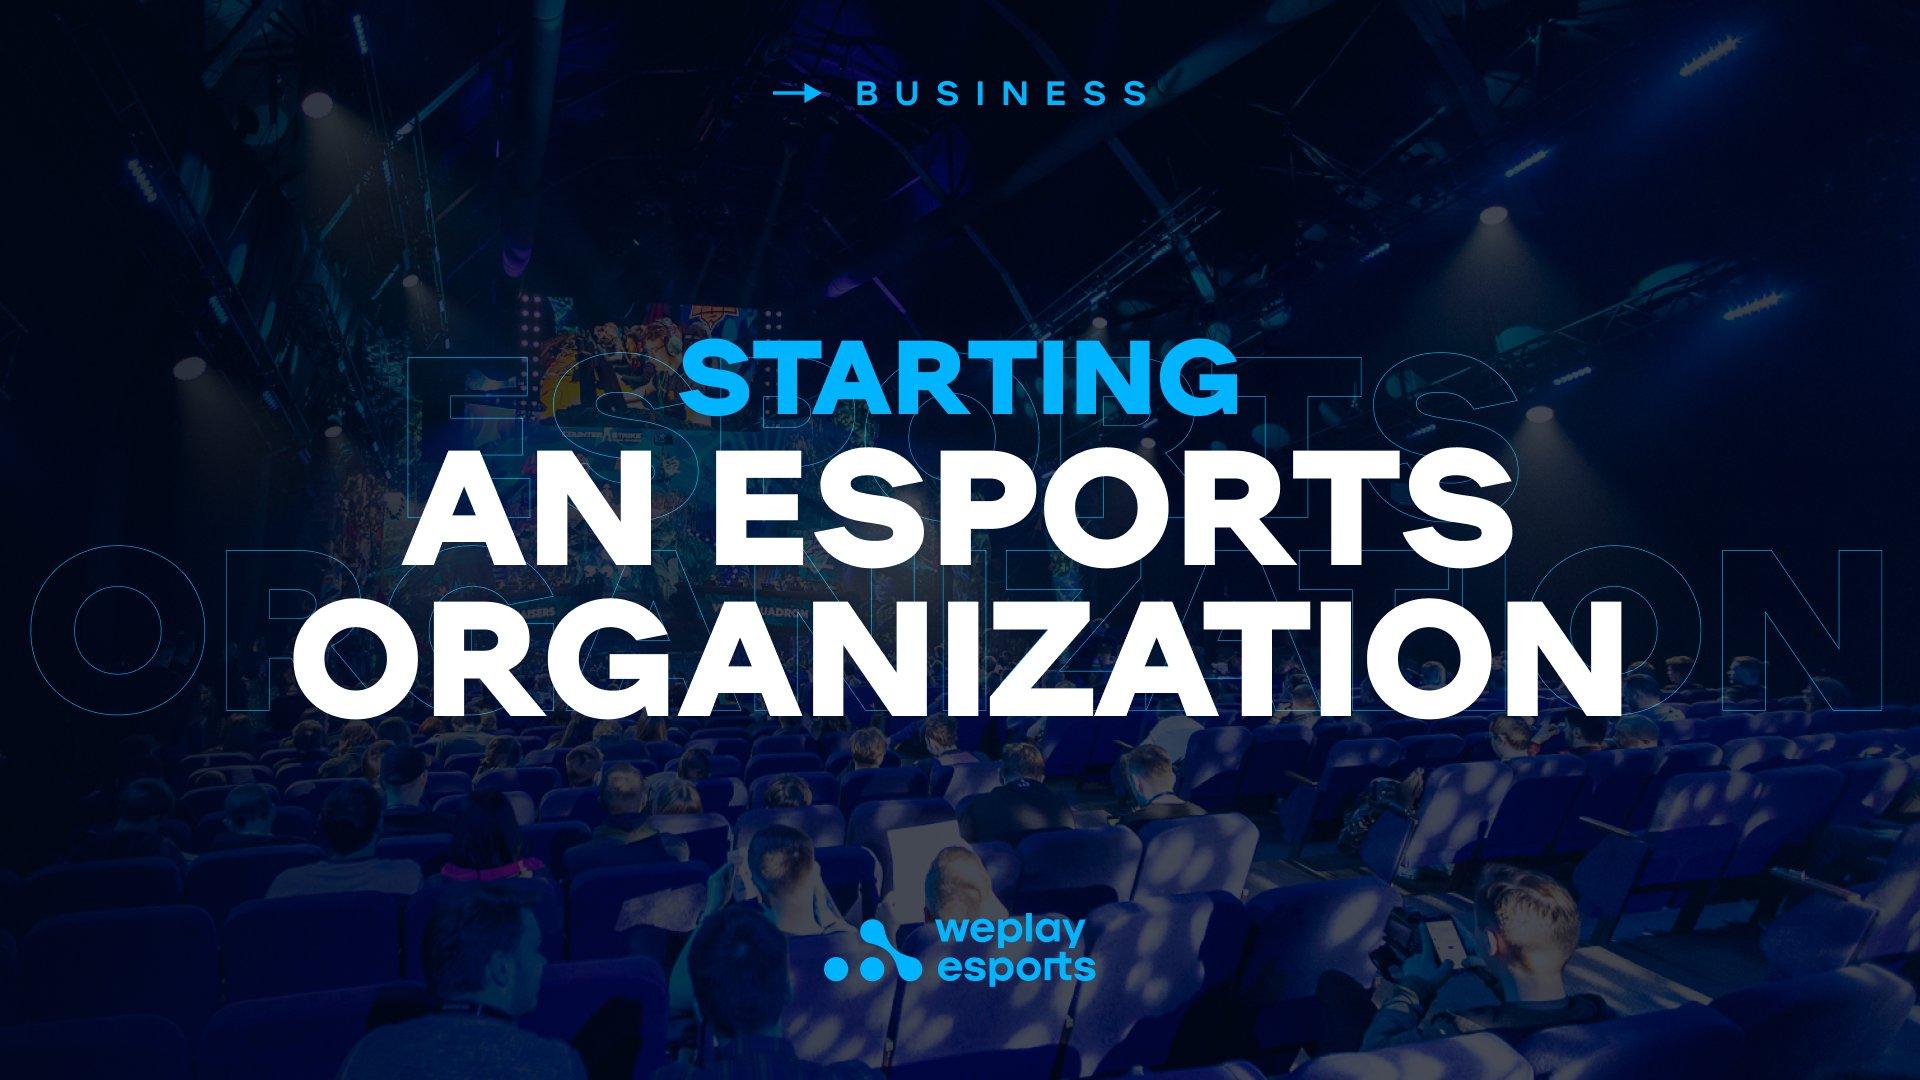 Starting an Esports Organization. Image: WePlay Holding